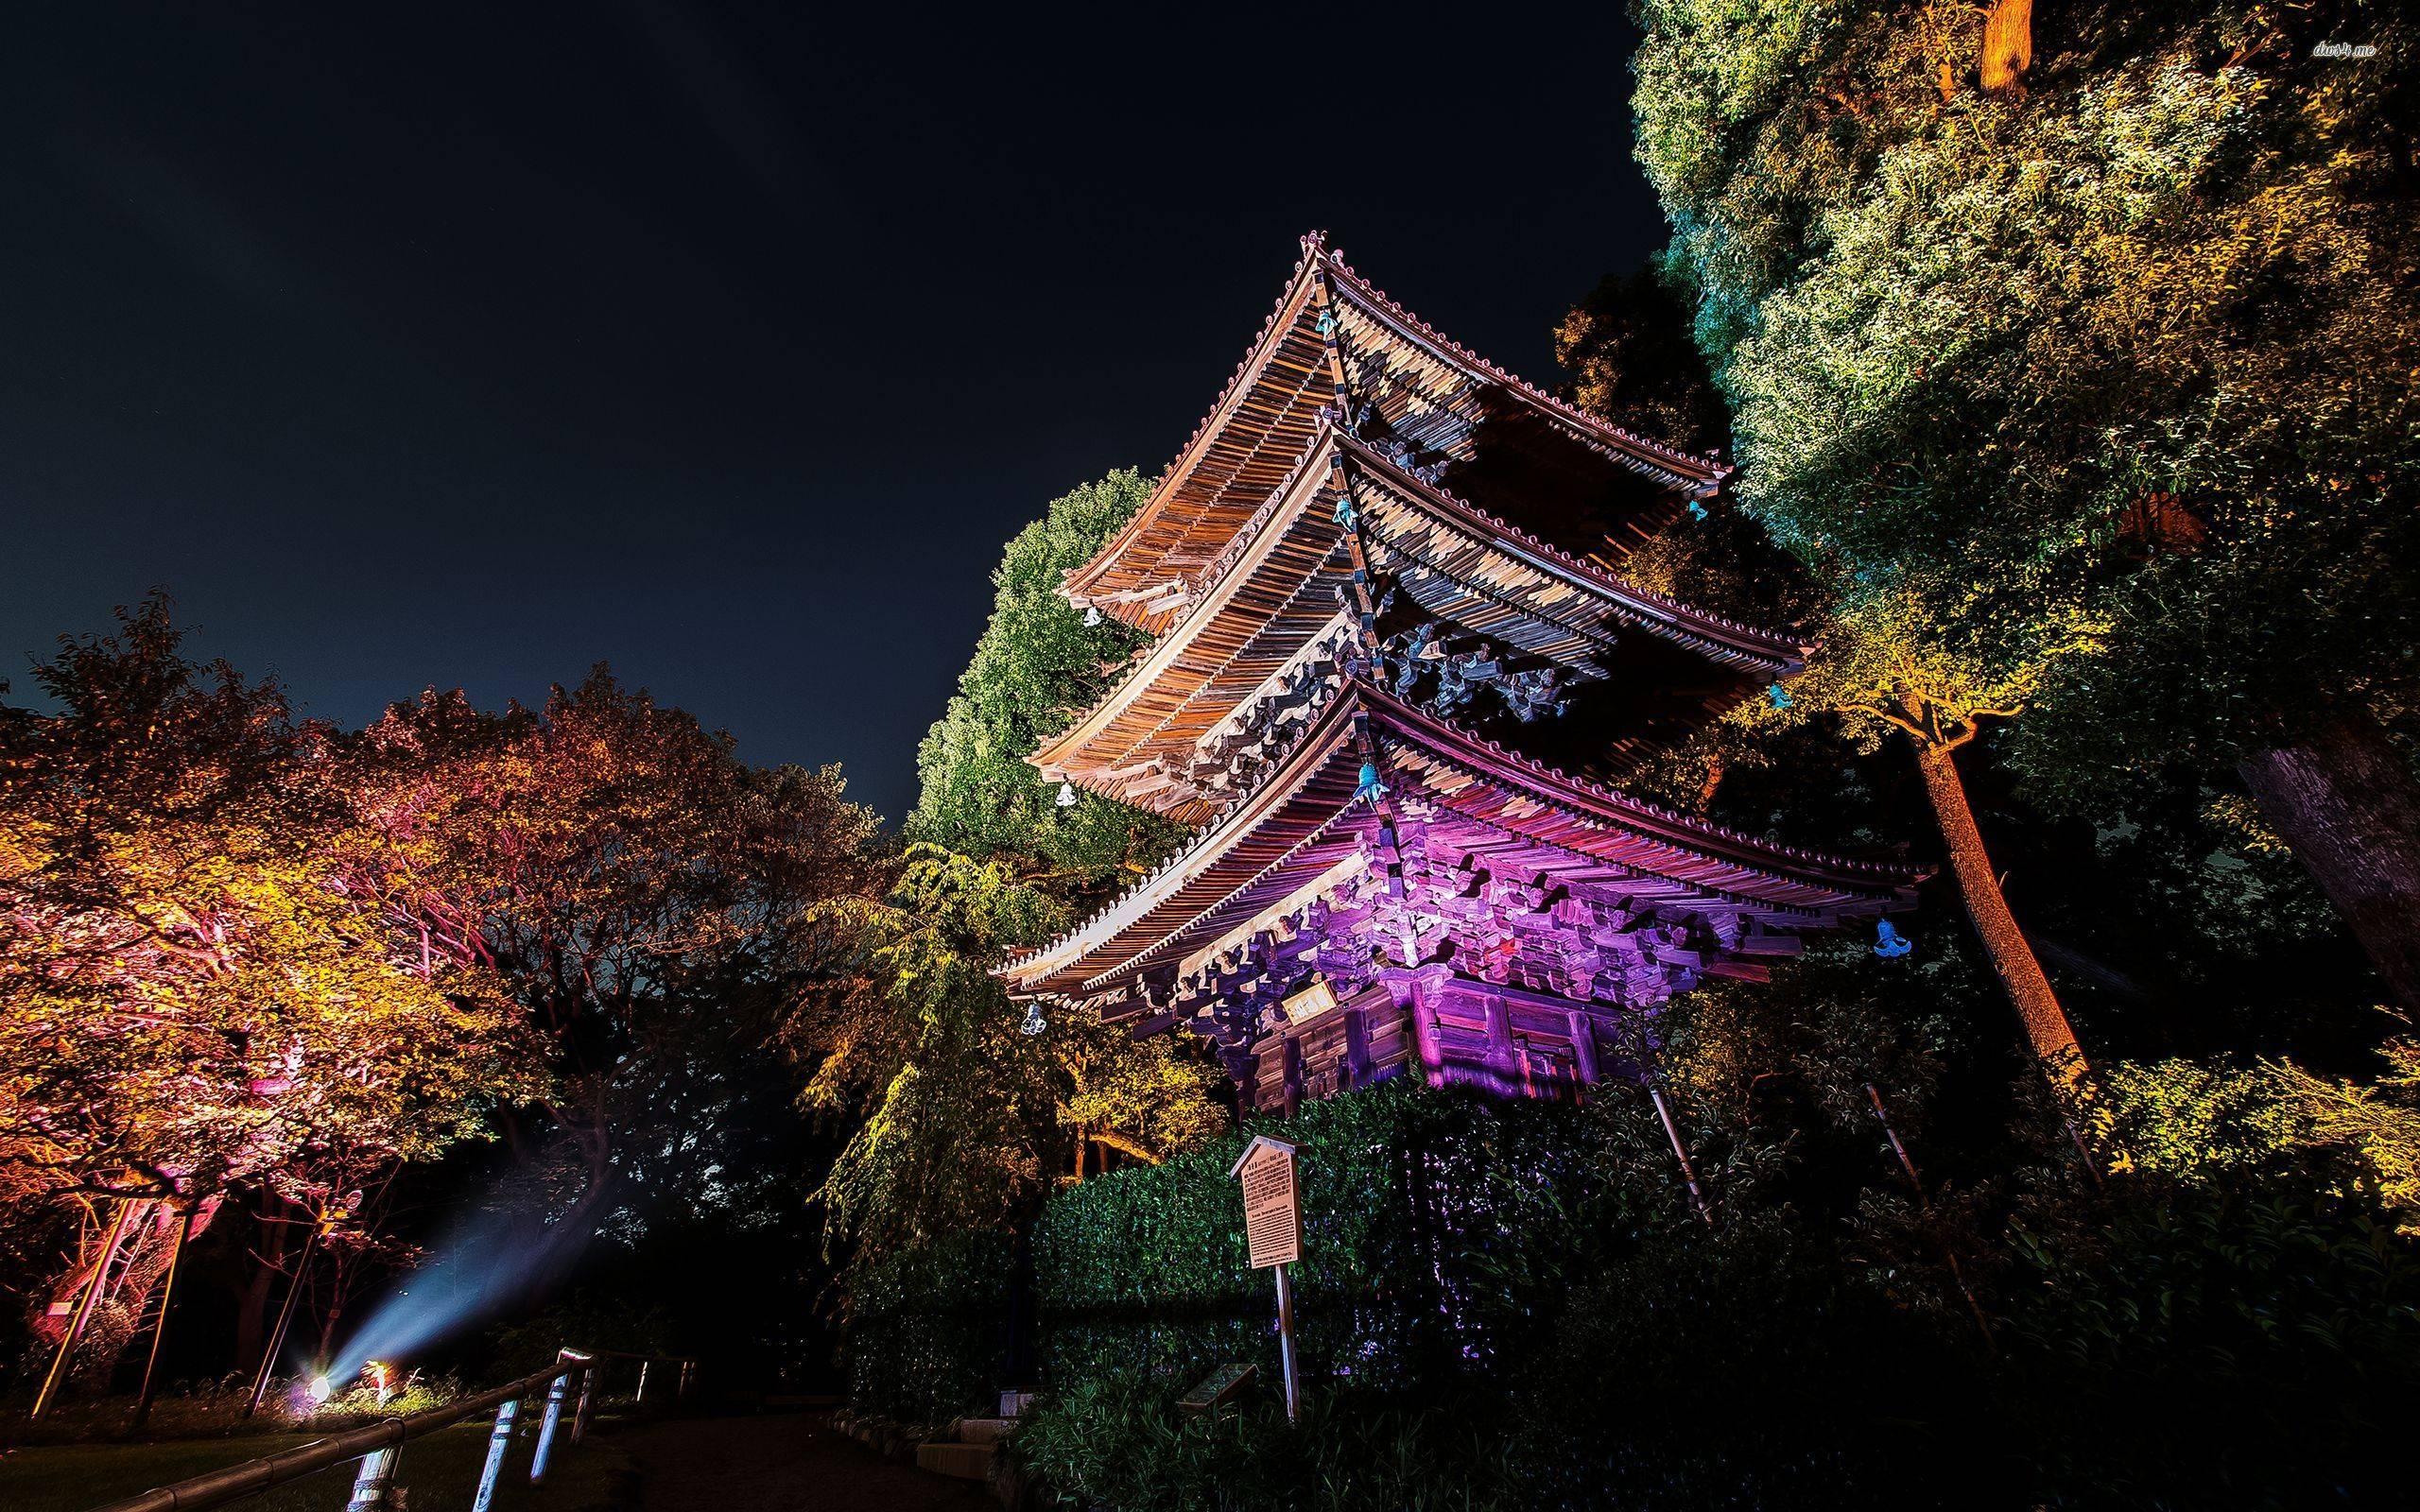 Chinzan-so Garden, Tokyo wallpaper - World wallpapers - #